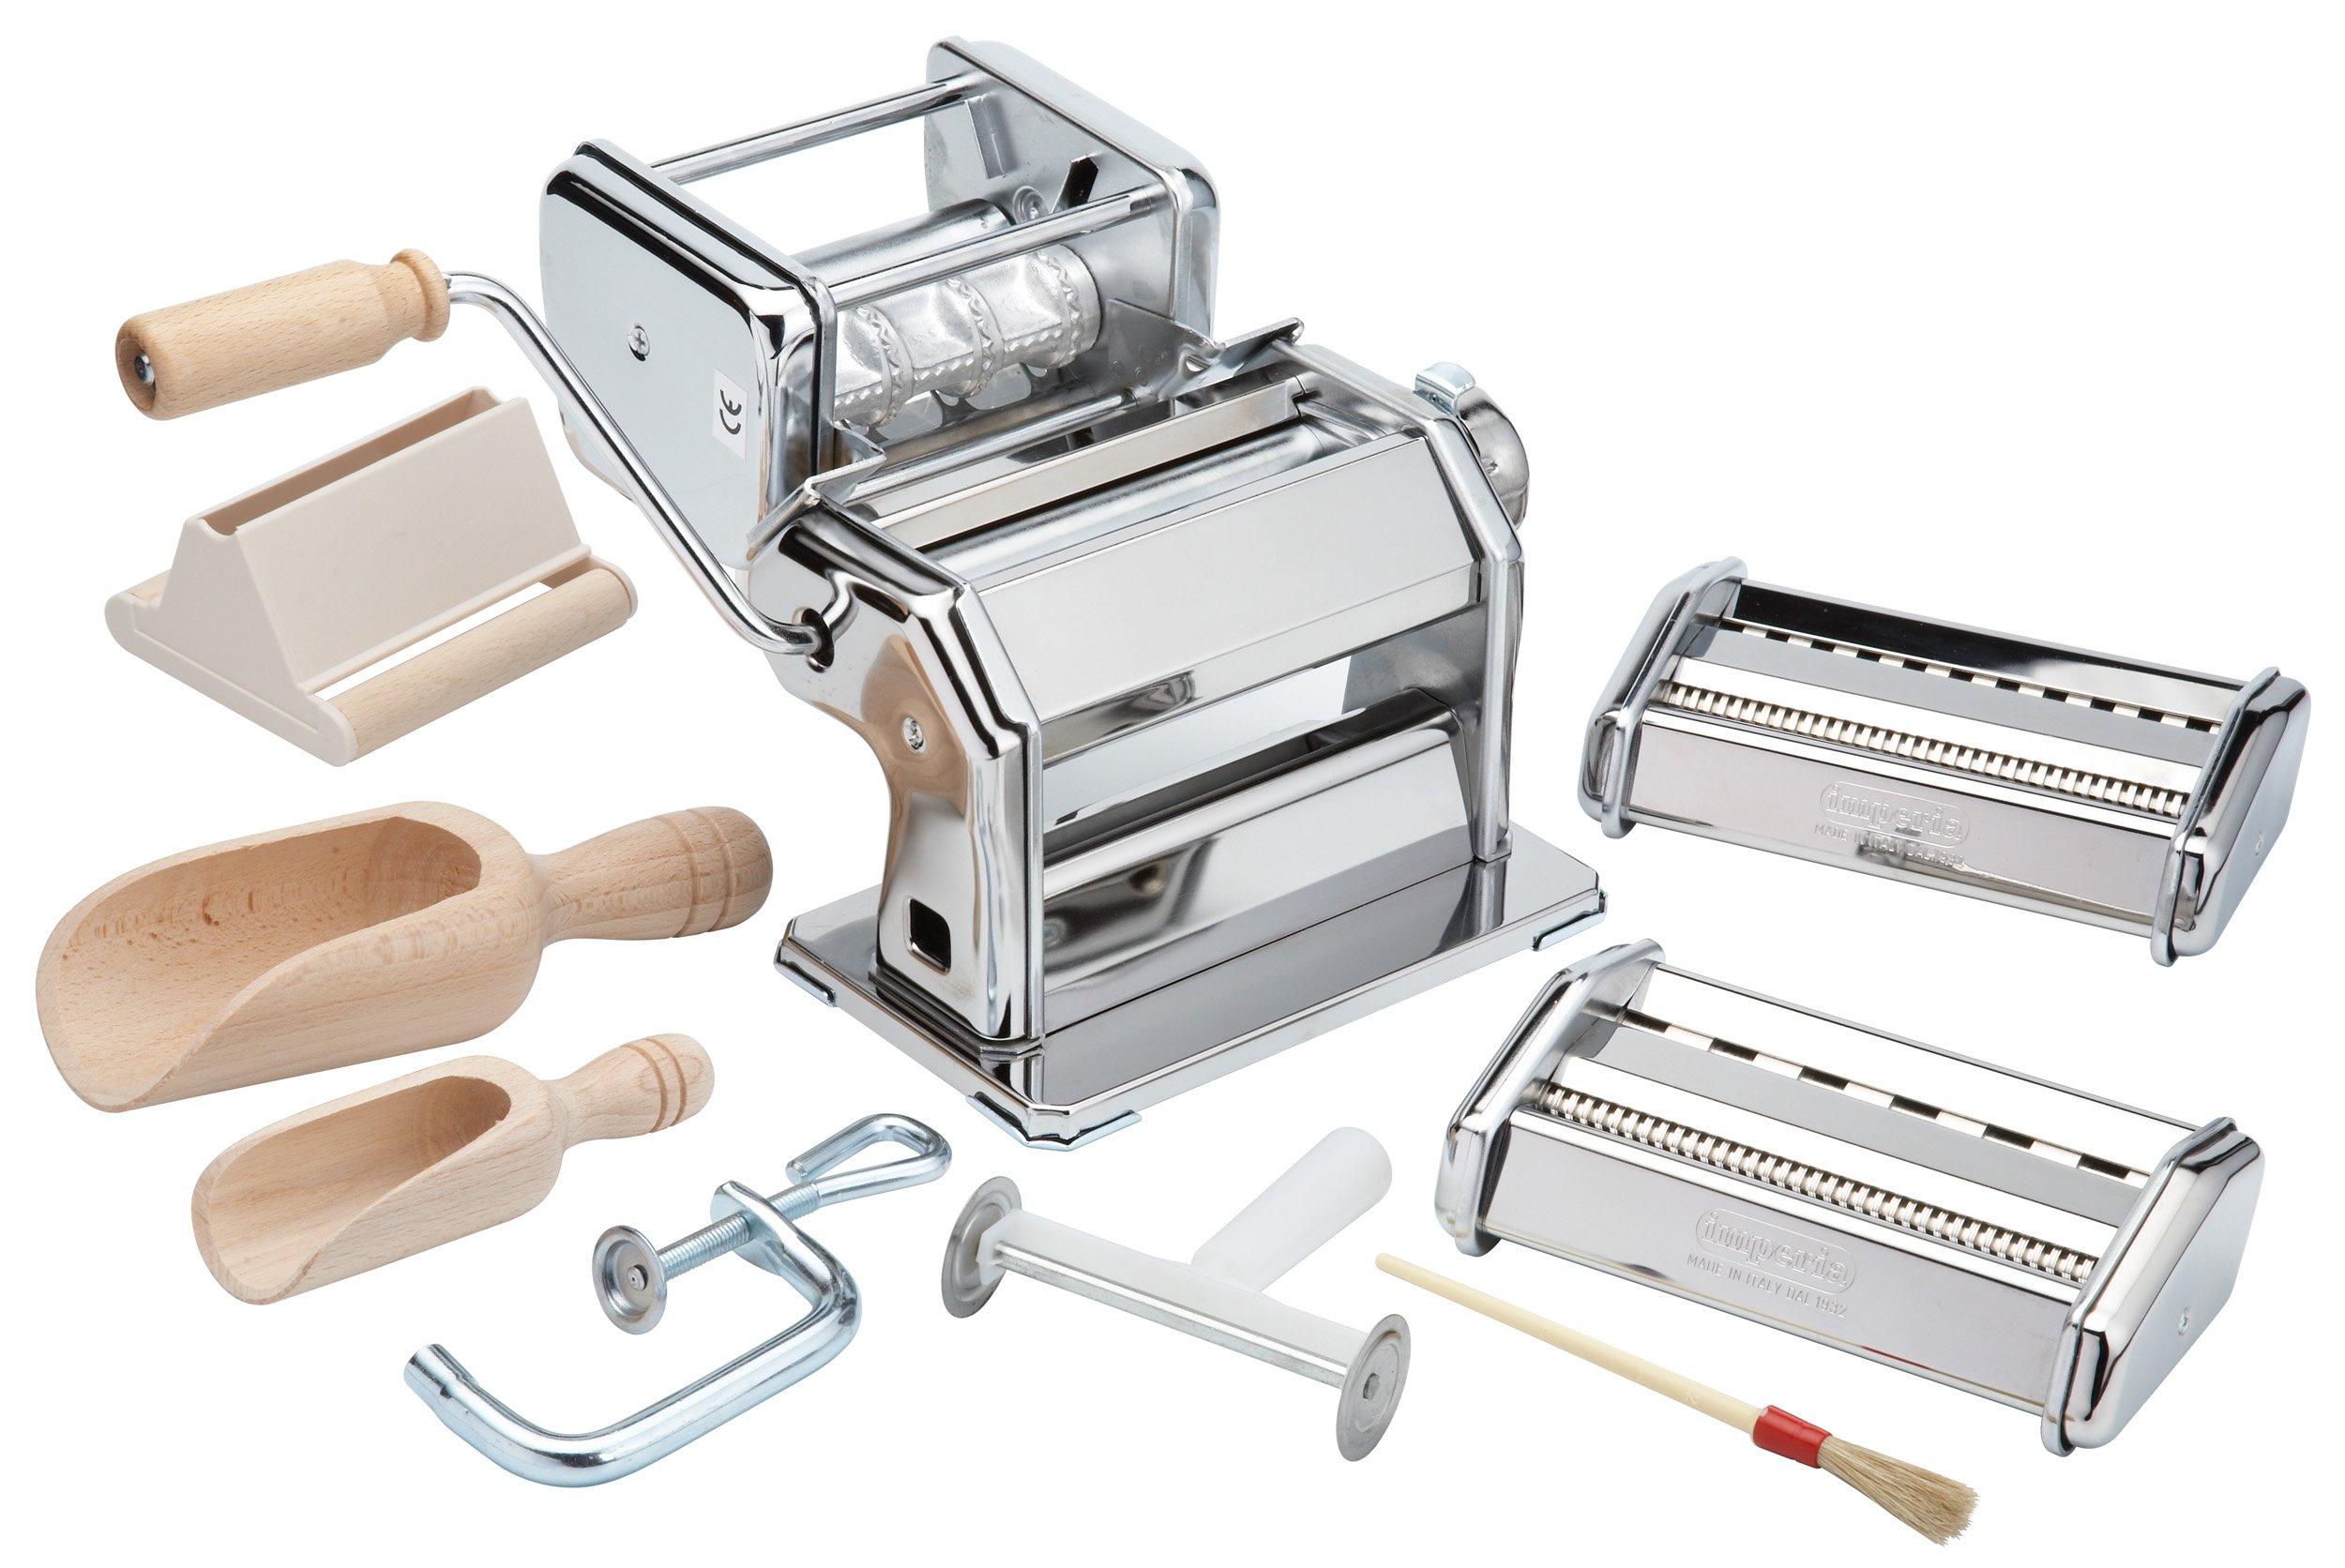 Imperia Pasta Maker Machine- Deluxe 11 Piece Set w Machine, Attachments, Recipes and Accessories by Imperia